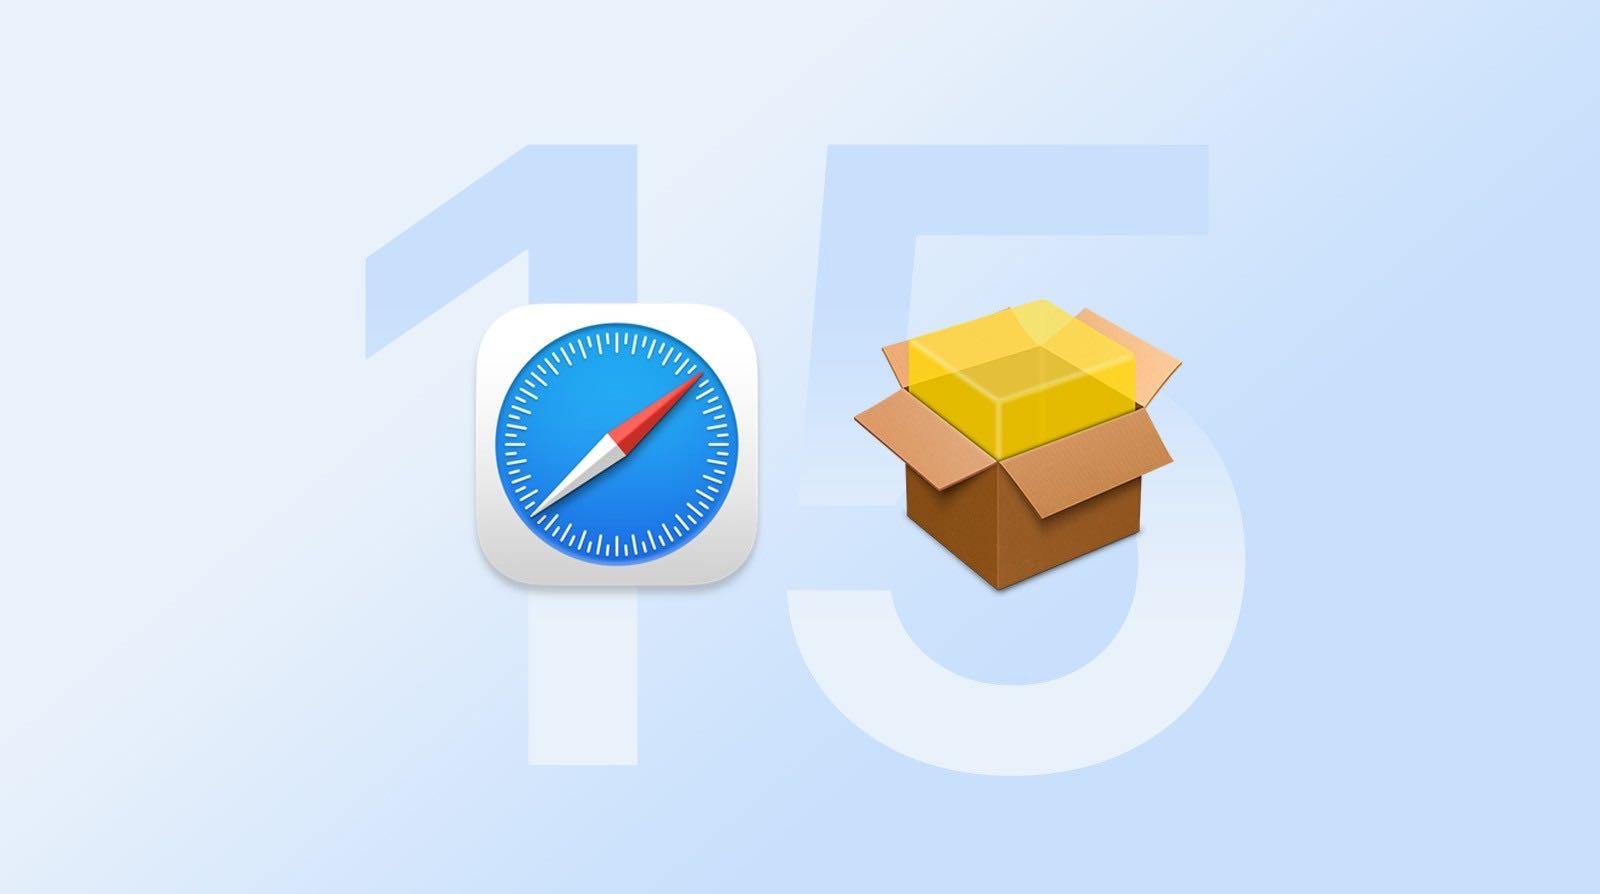 Safari 15 for macOS Catalina beta 1 下载